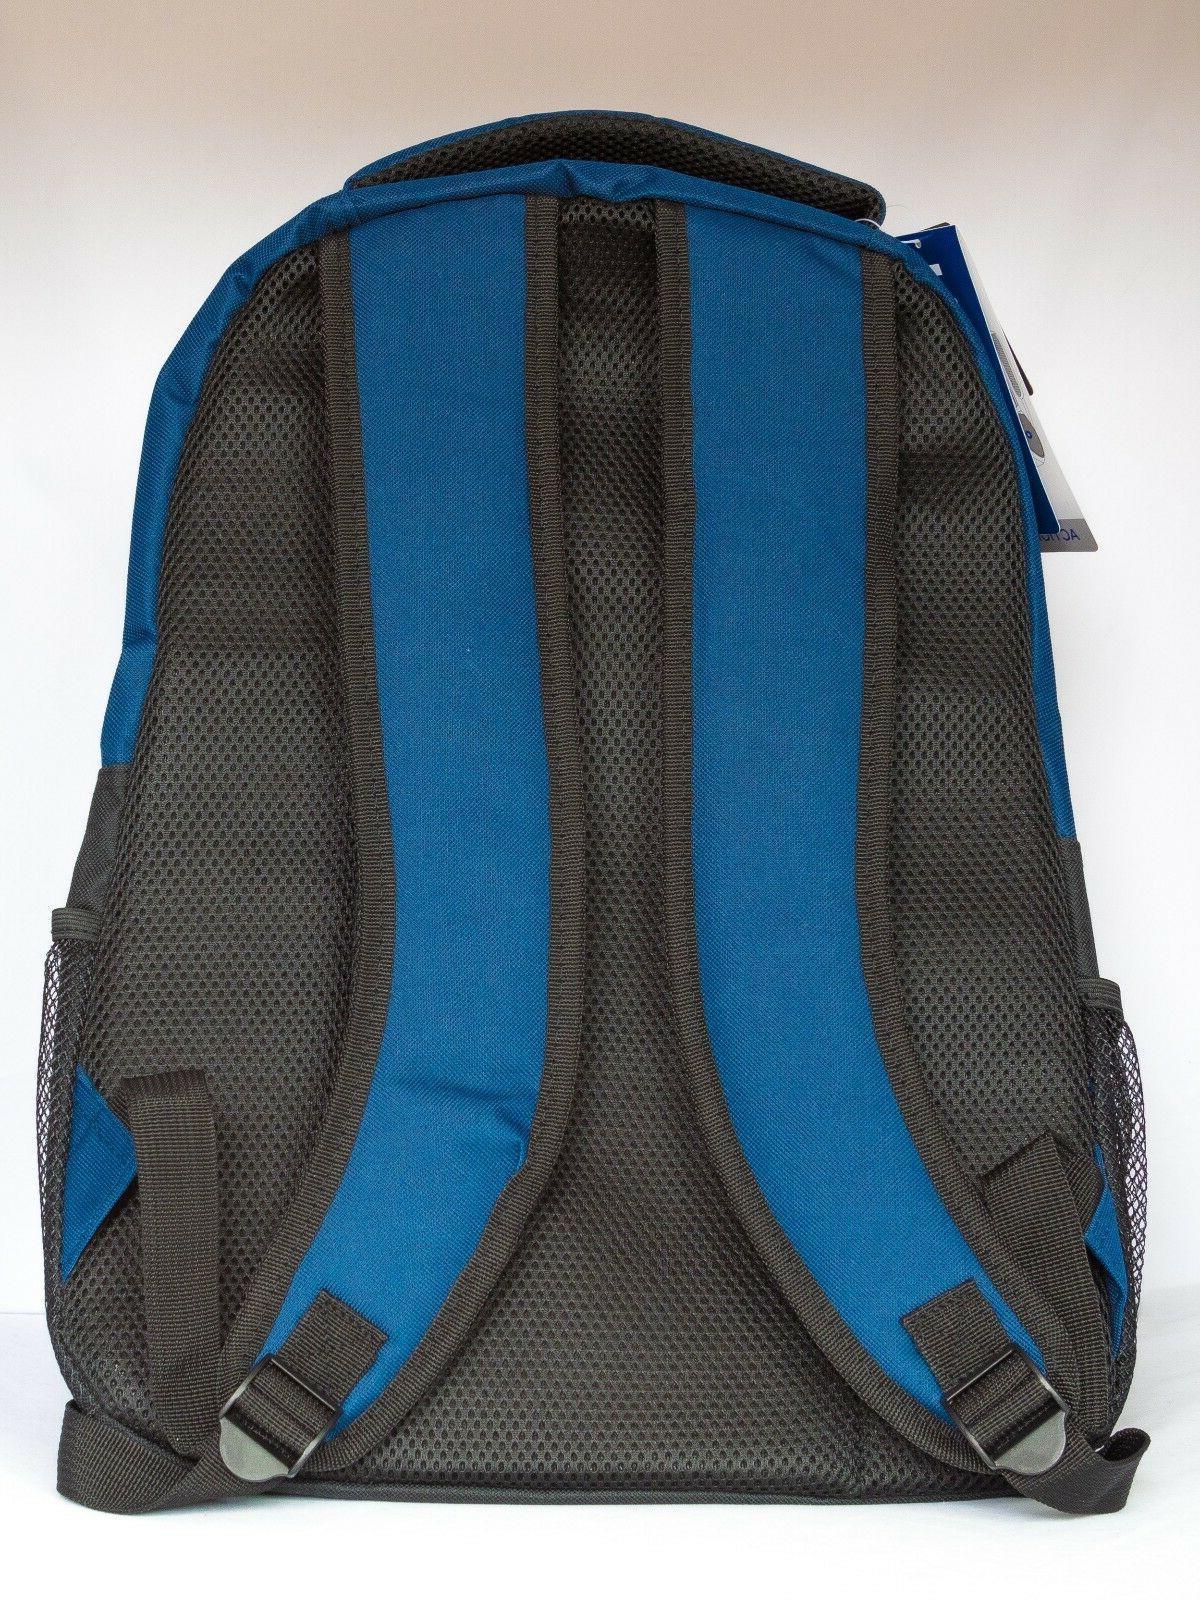 Dallas Cowboys Backpack Action Laptop